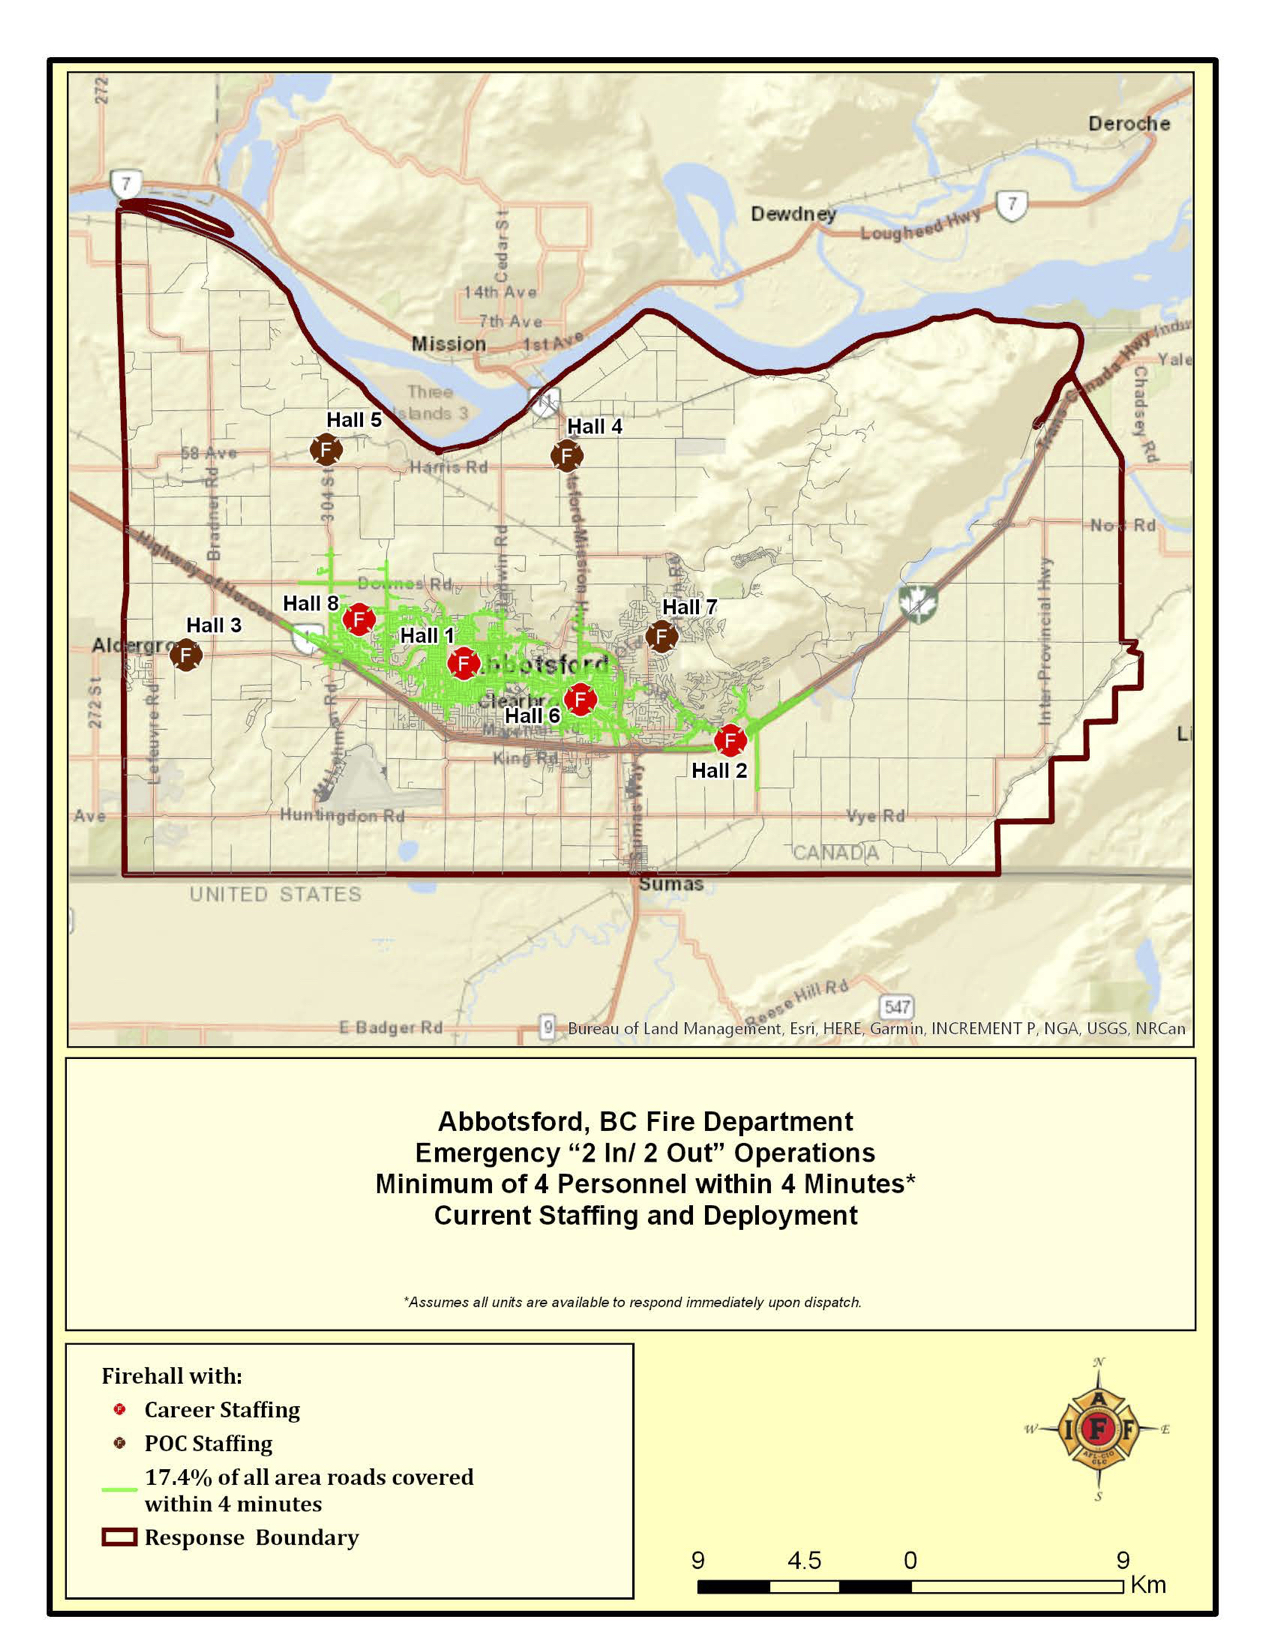 Abbotsford BC Map Binder1 (dragged) 2.jpg